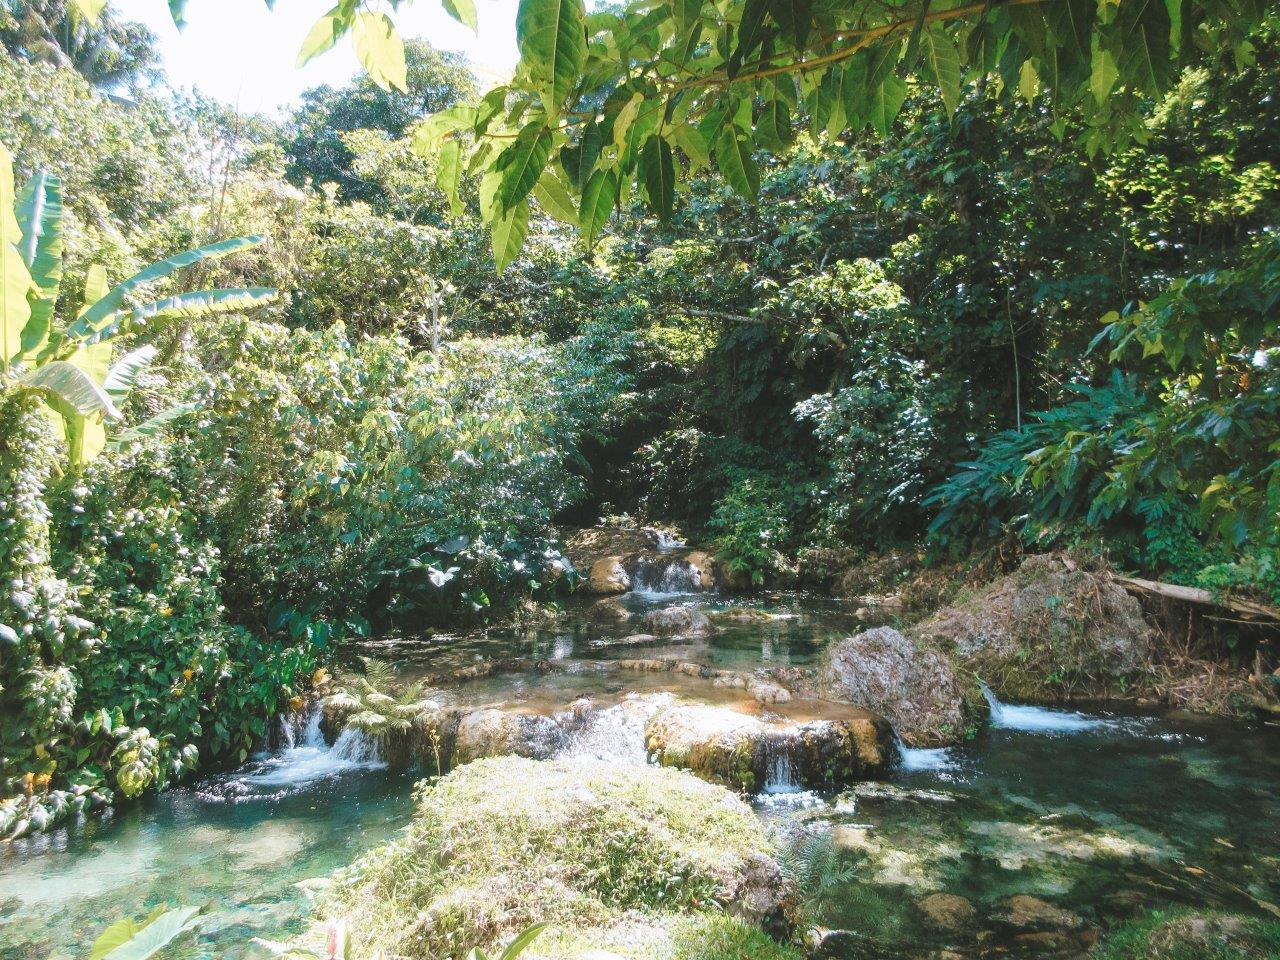 Visiting Mele Cascades